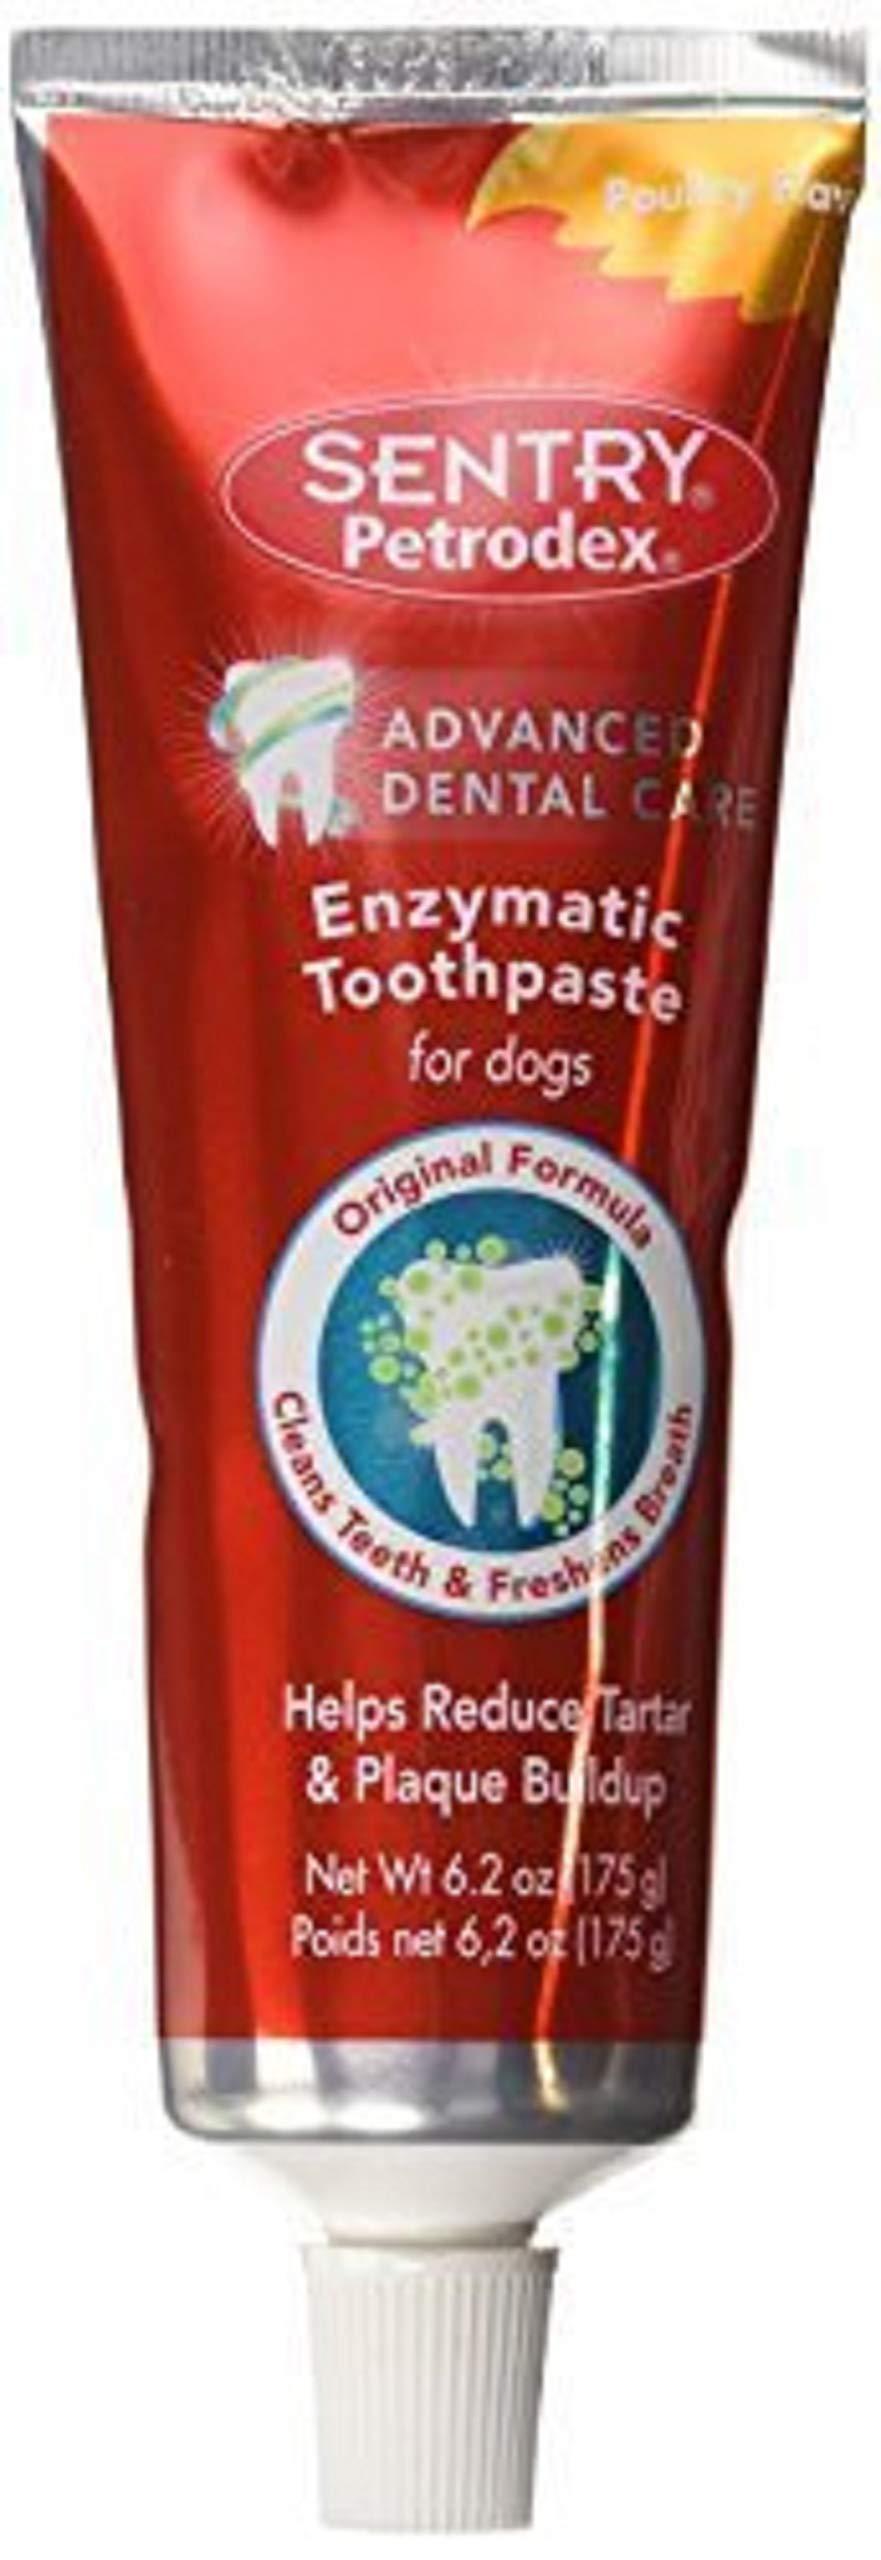 Petrodex Enzymatic Toothpaste Dog Poultry Flavor FamilyValue 2Pack (6.2oz)-Mey-Petrodex by Petrodex